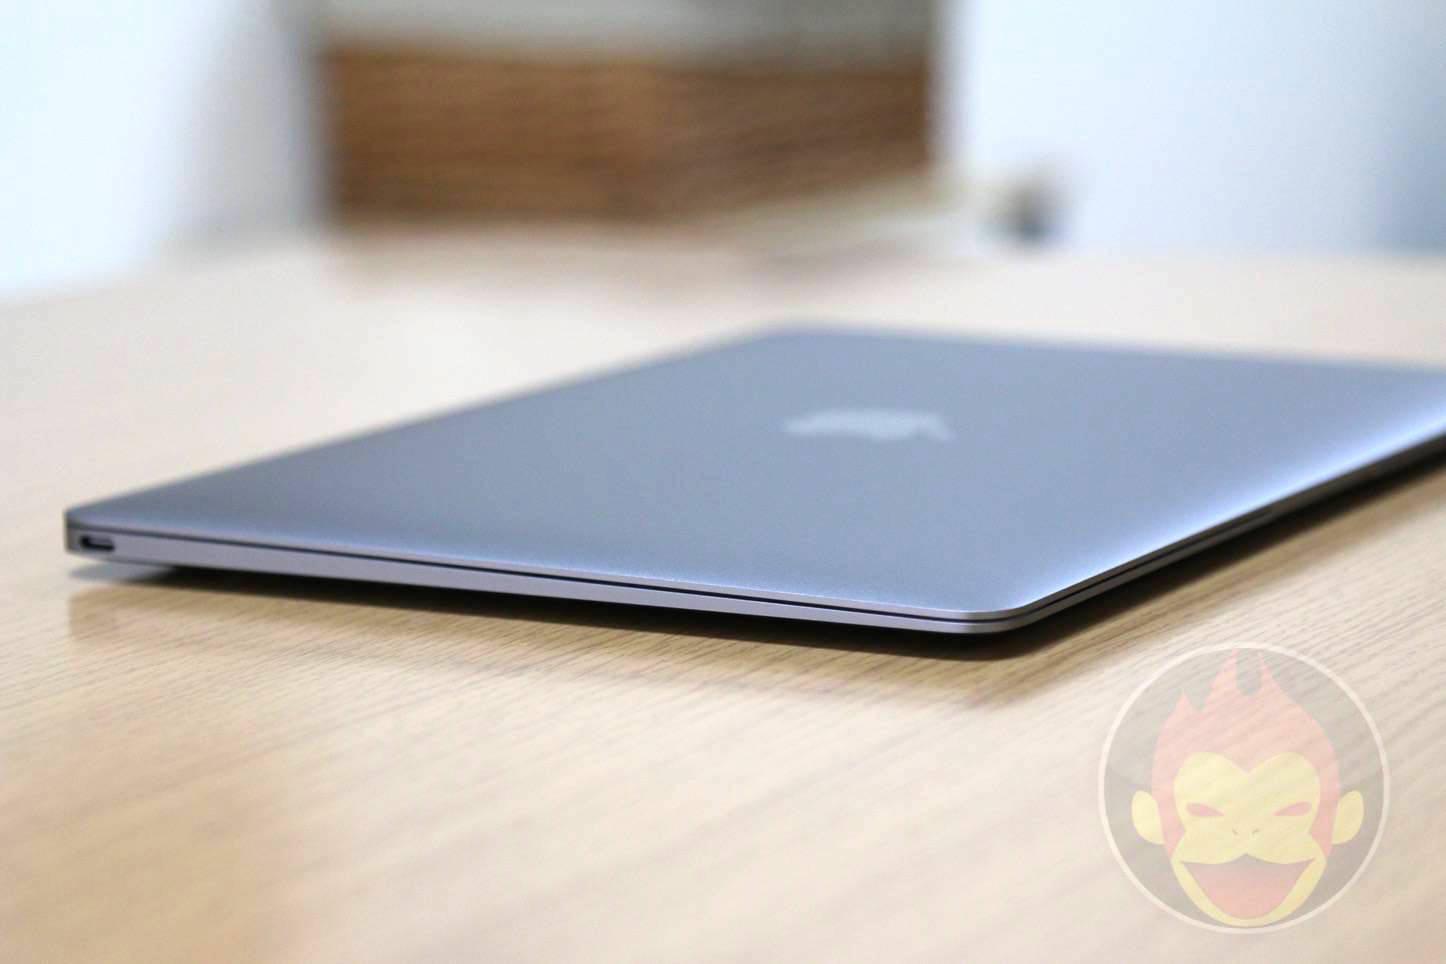 12inch-The-New-MacBook-49.JPG